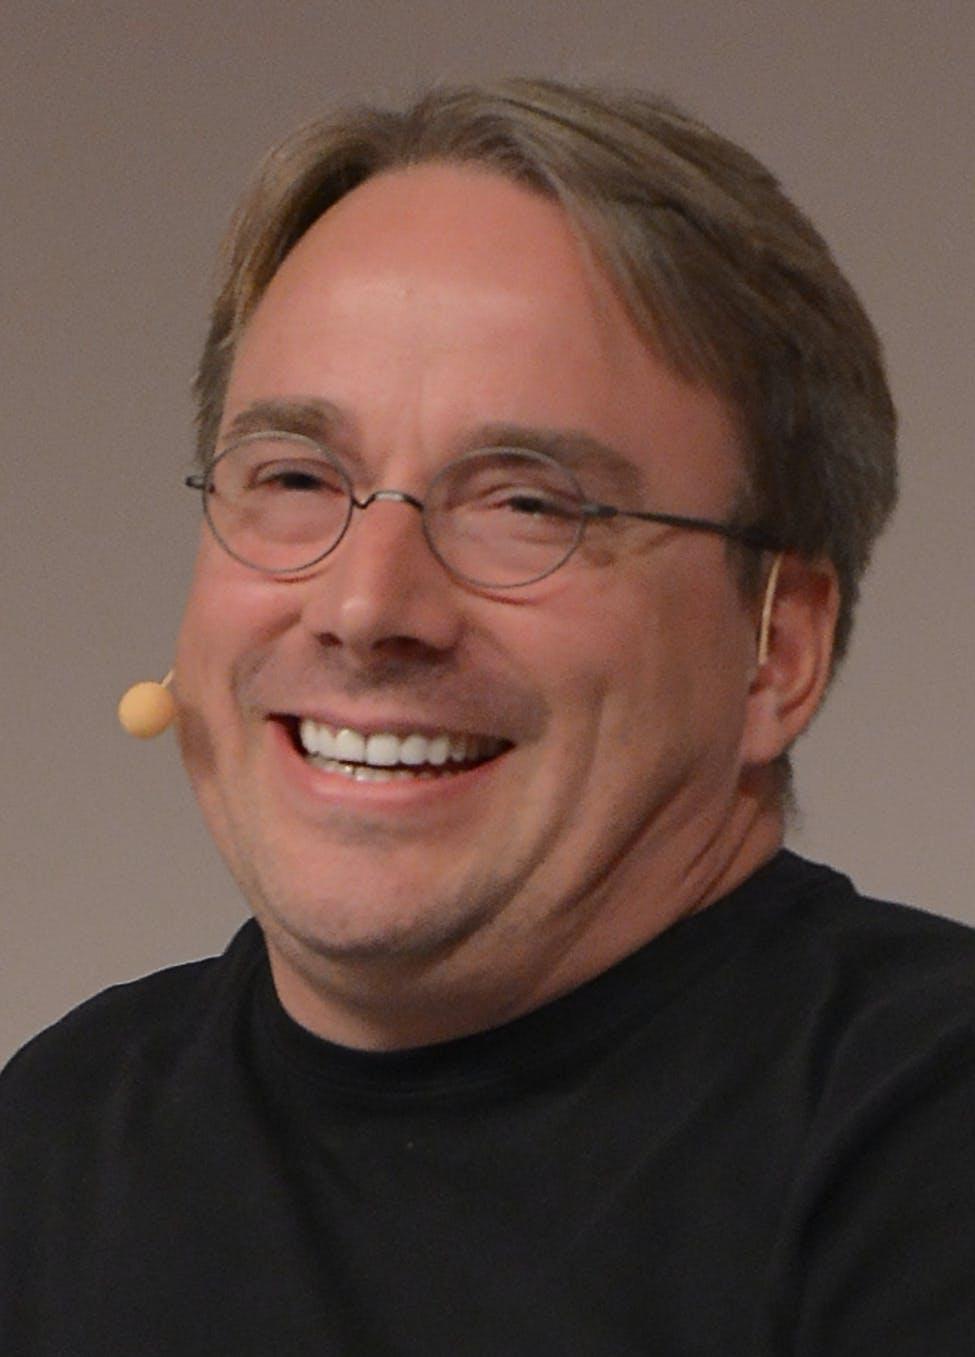 LinuxCon_Europe_Linus_Torvalds_03_(cropped).jpg